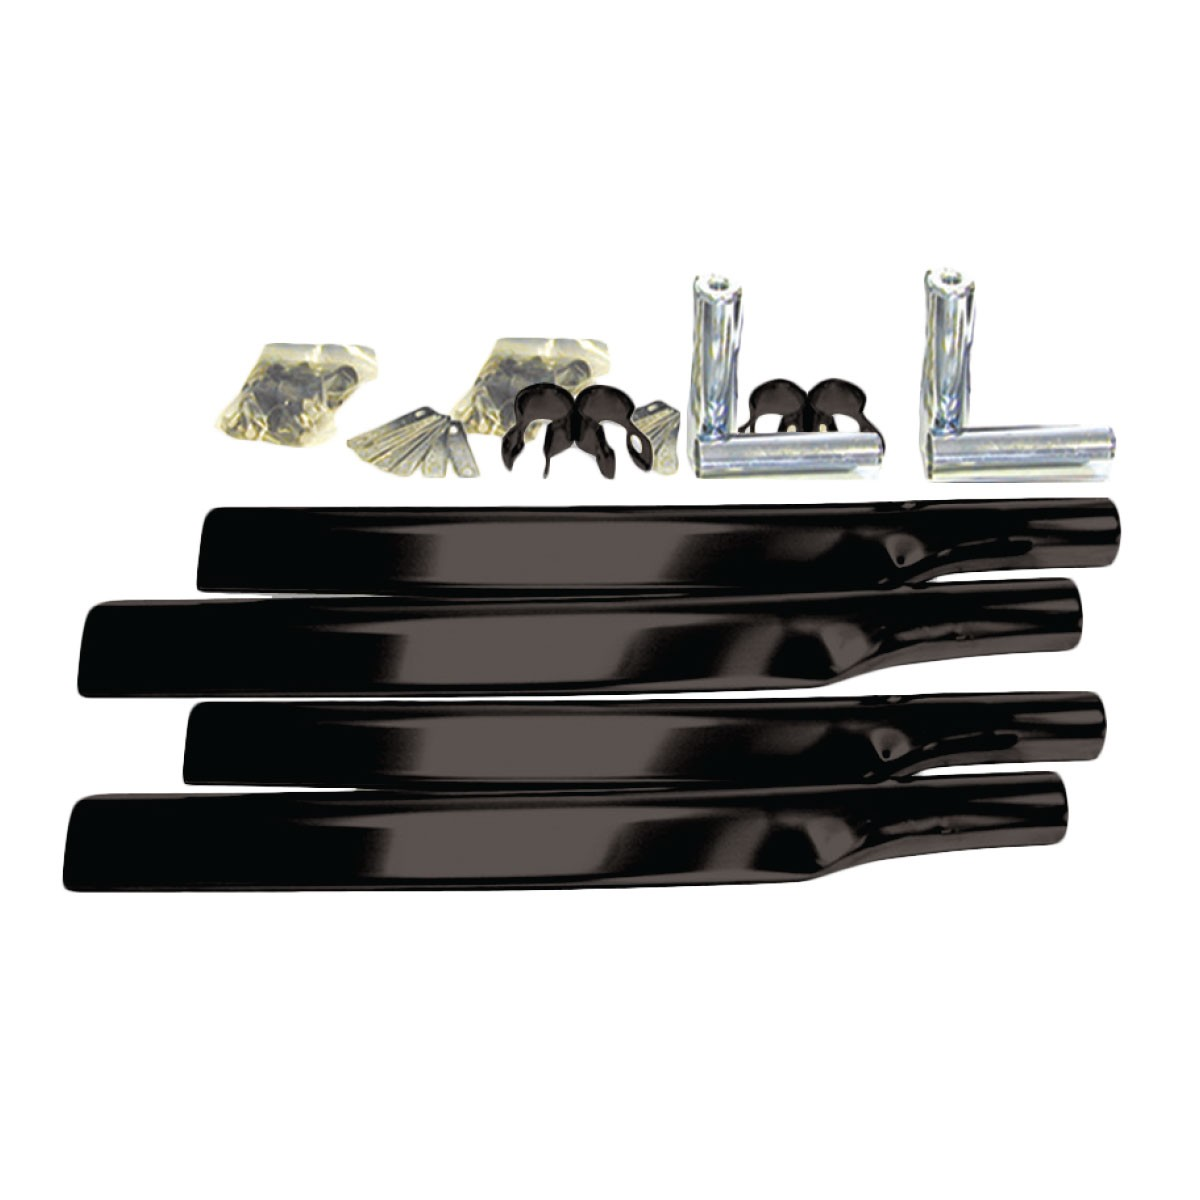 Poly Fender Mounting Kit : Poly single axle fender mounting kit w black triangular arms